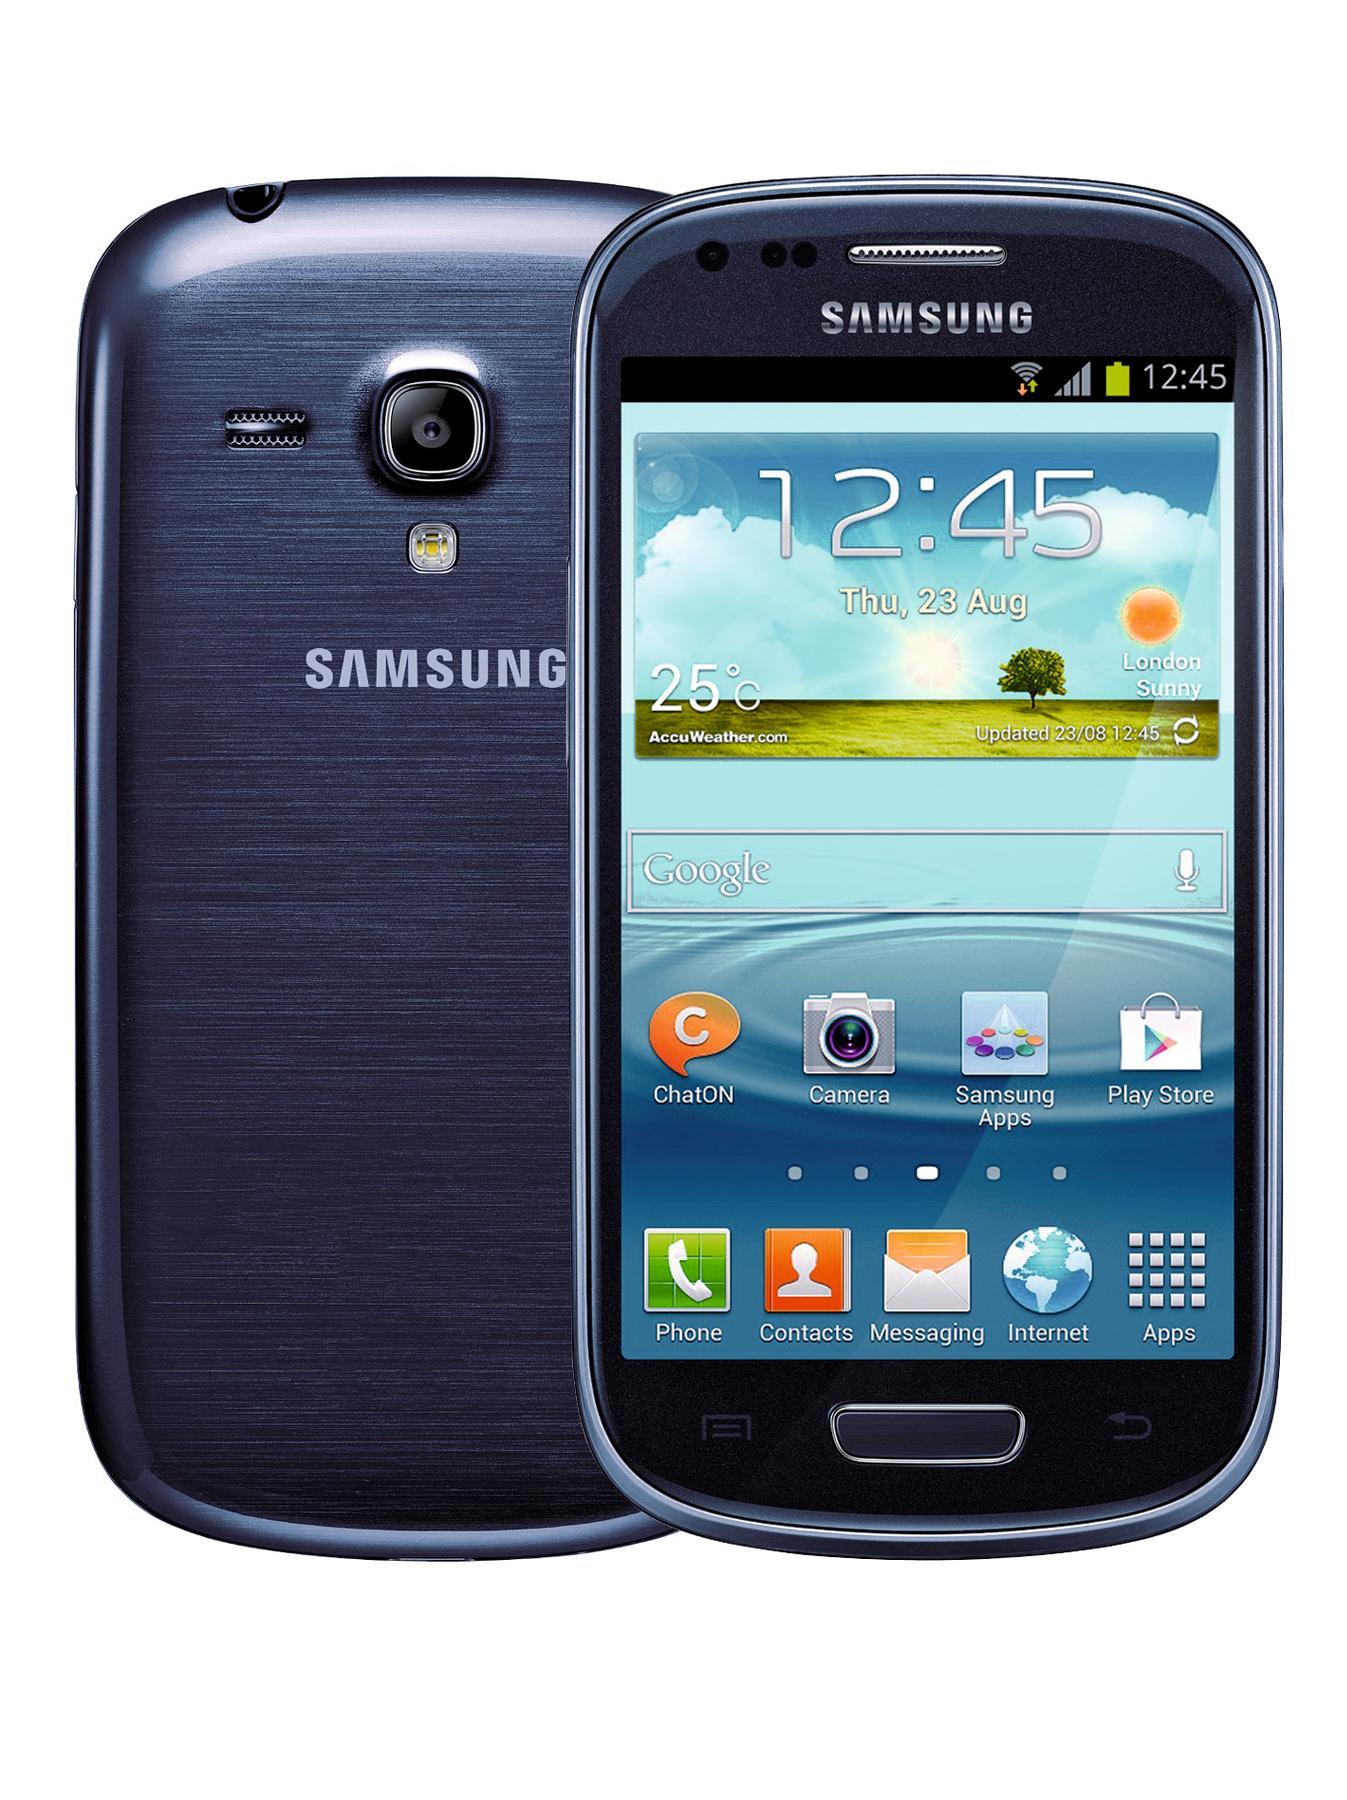 Samsung Galaxy S3 Mini 4 inch Smartphone - Blue - Blue, Blue